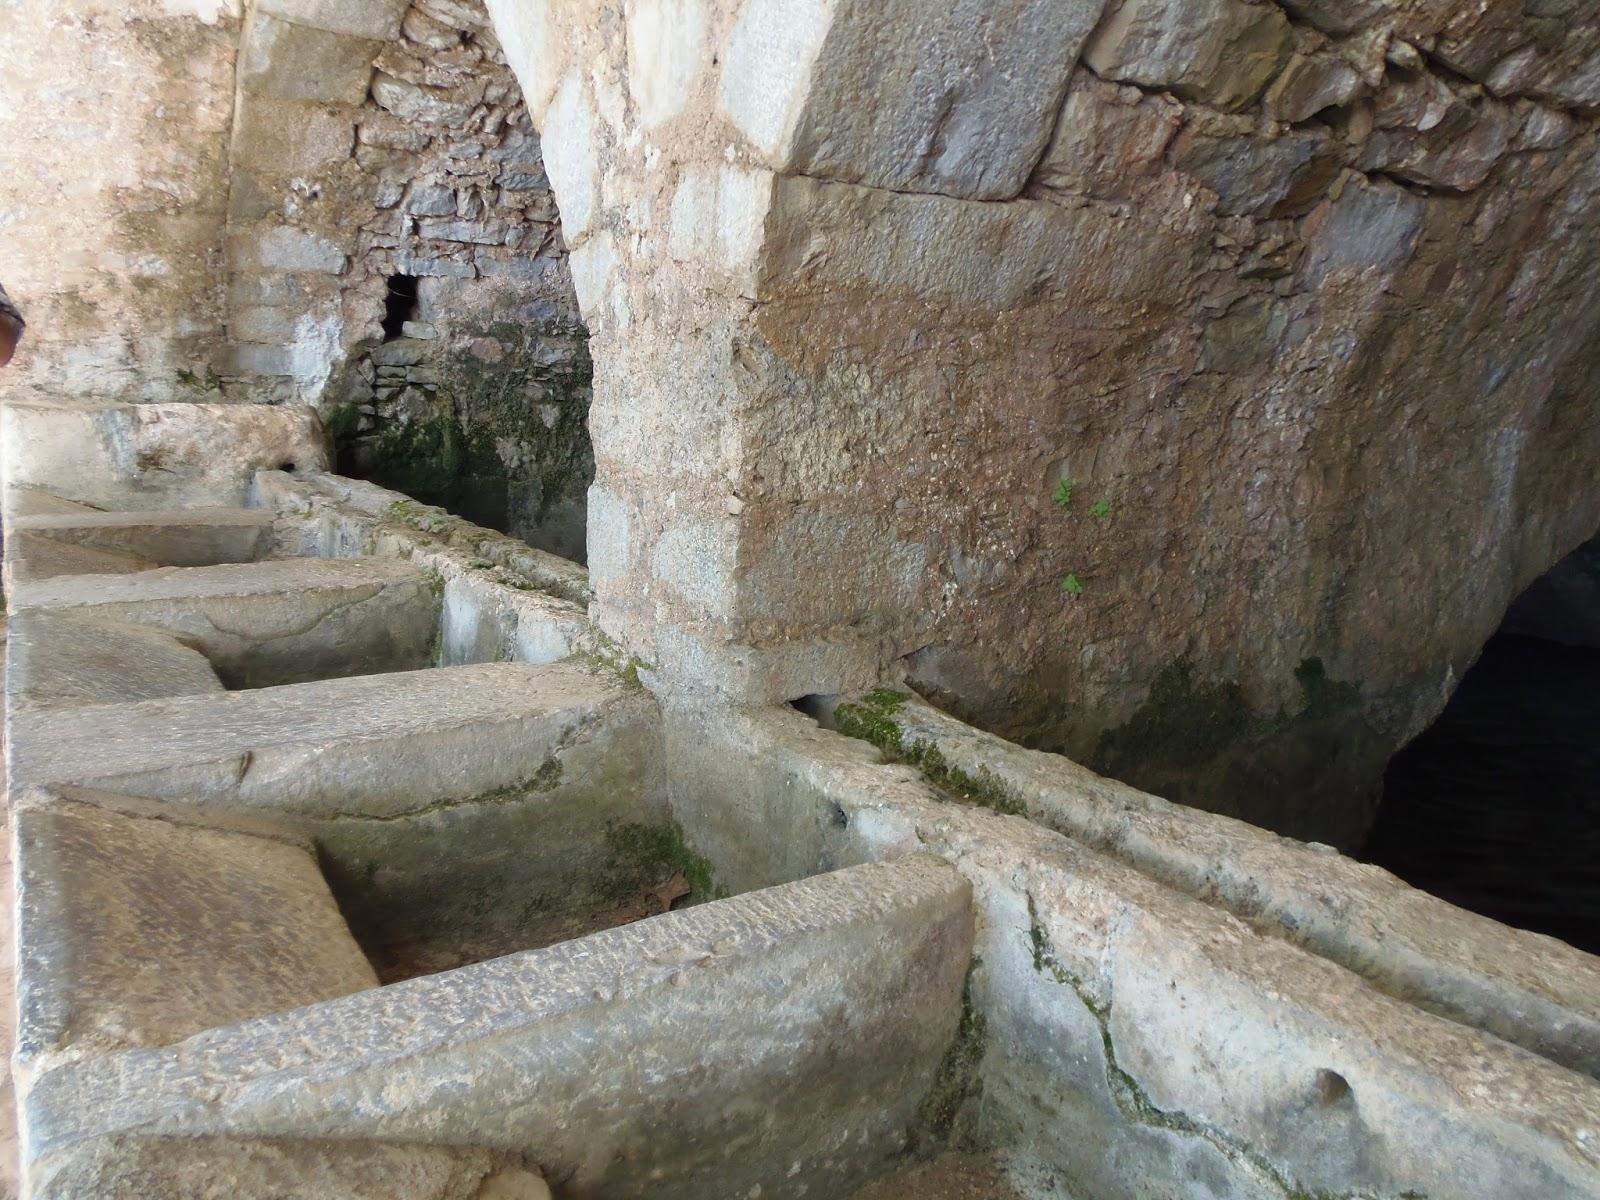 spring water, washing, maids, crete, hersonissos, greece, travel, travel blogger